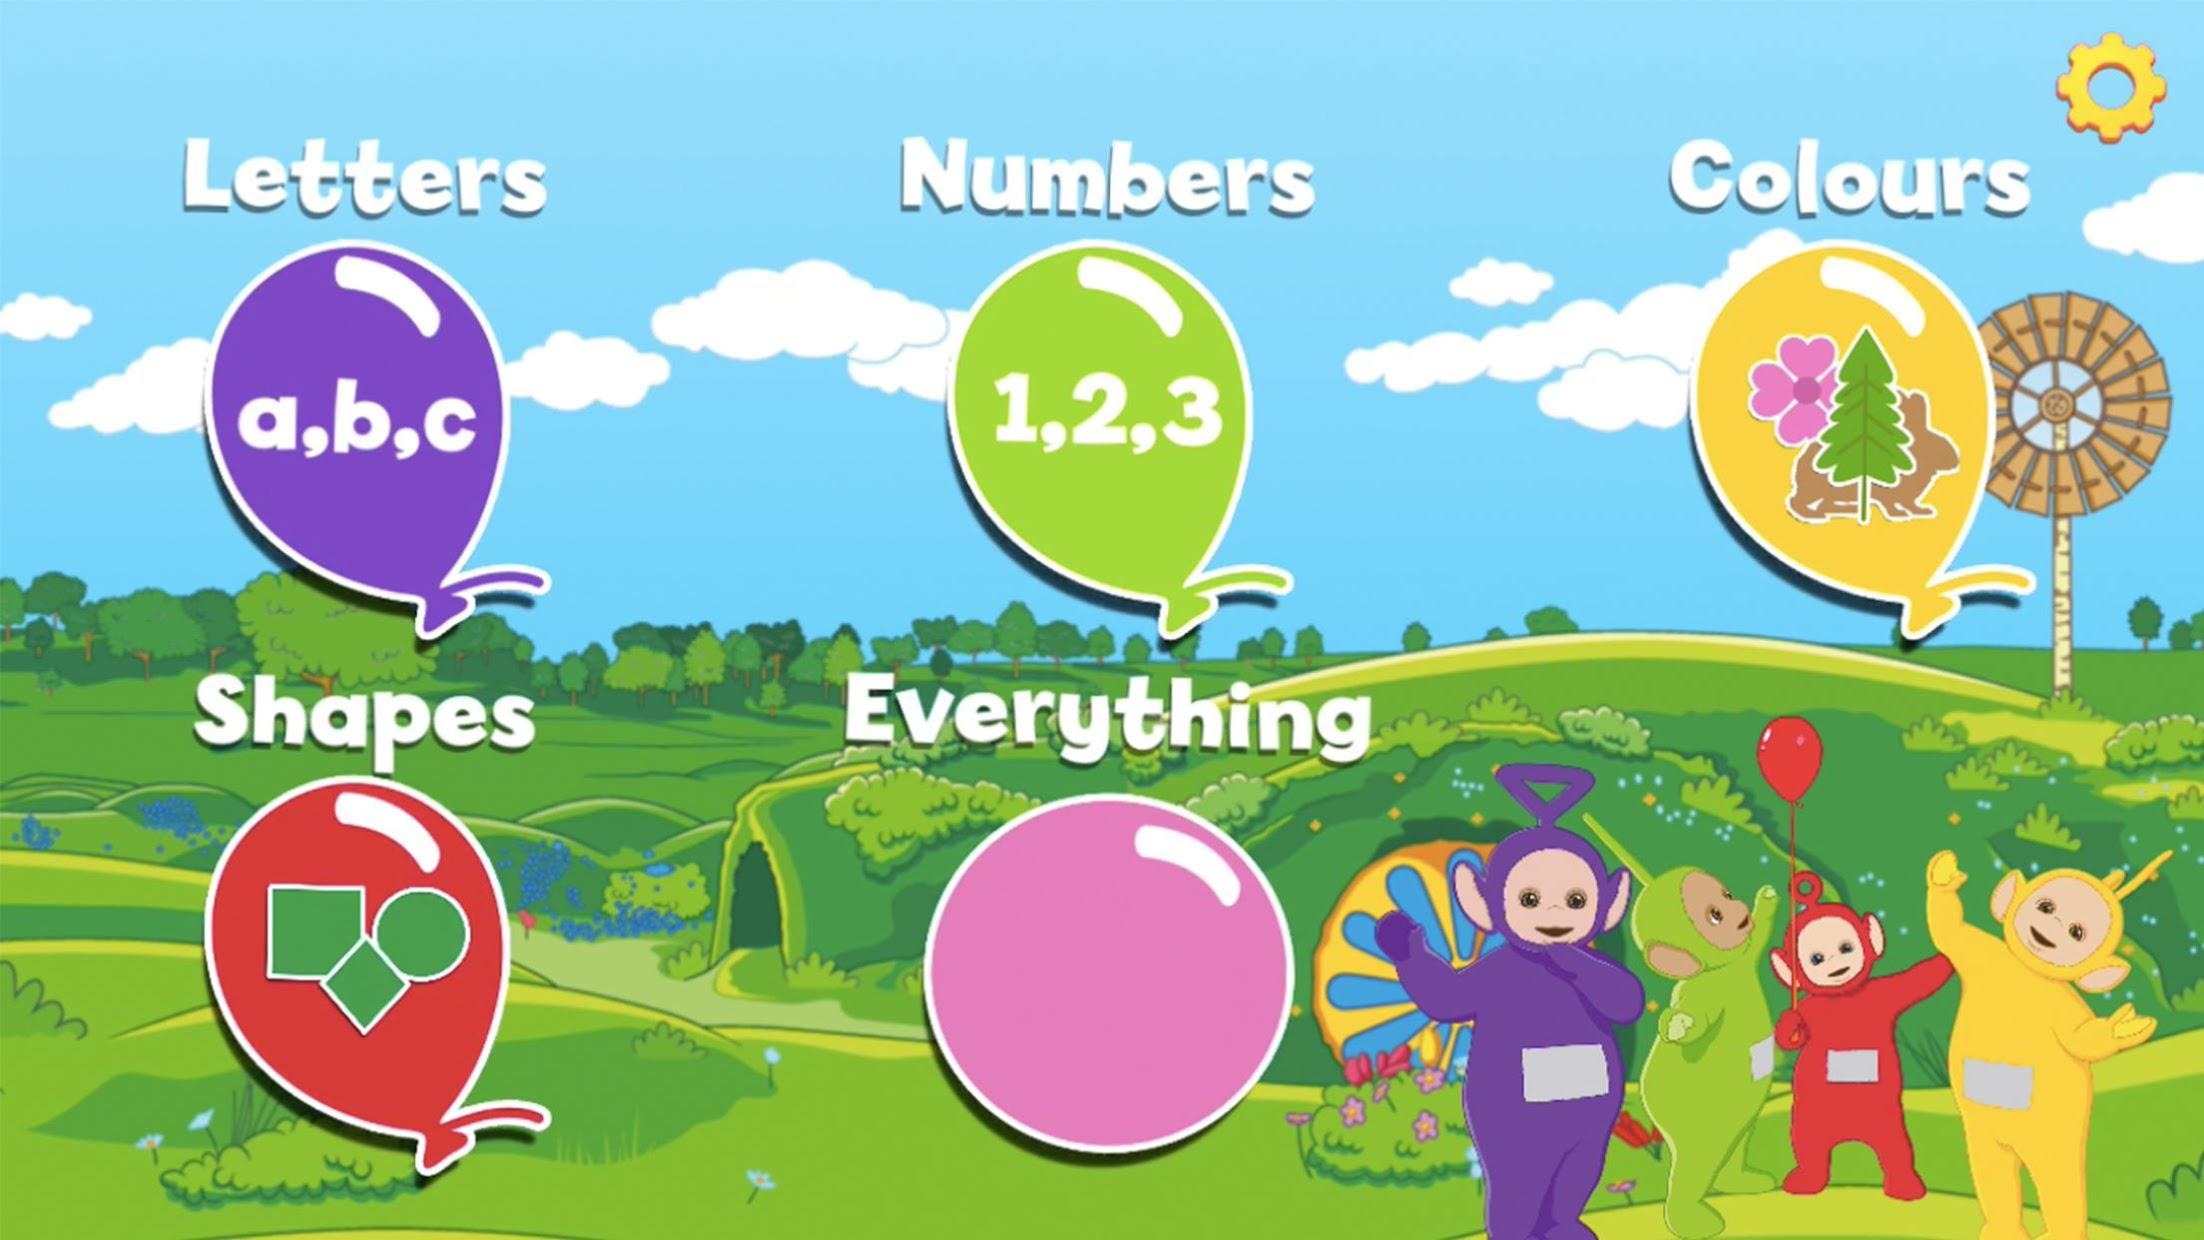 Teletubbies Balloon Pop Game For Kids 游戏截图1